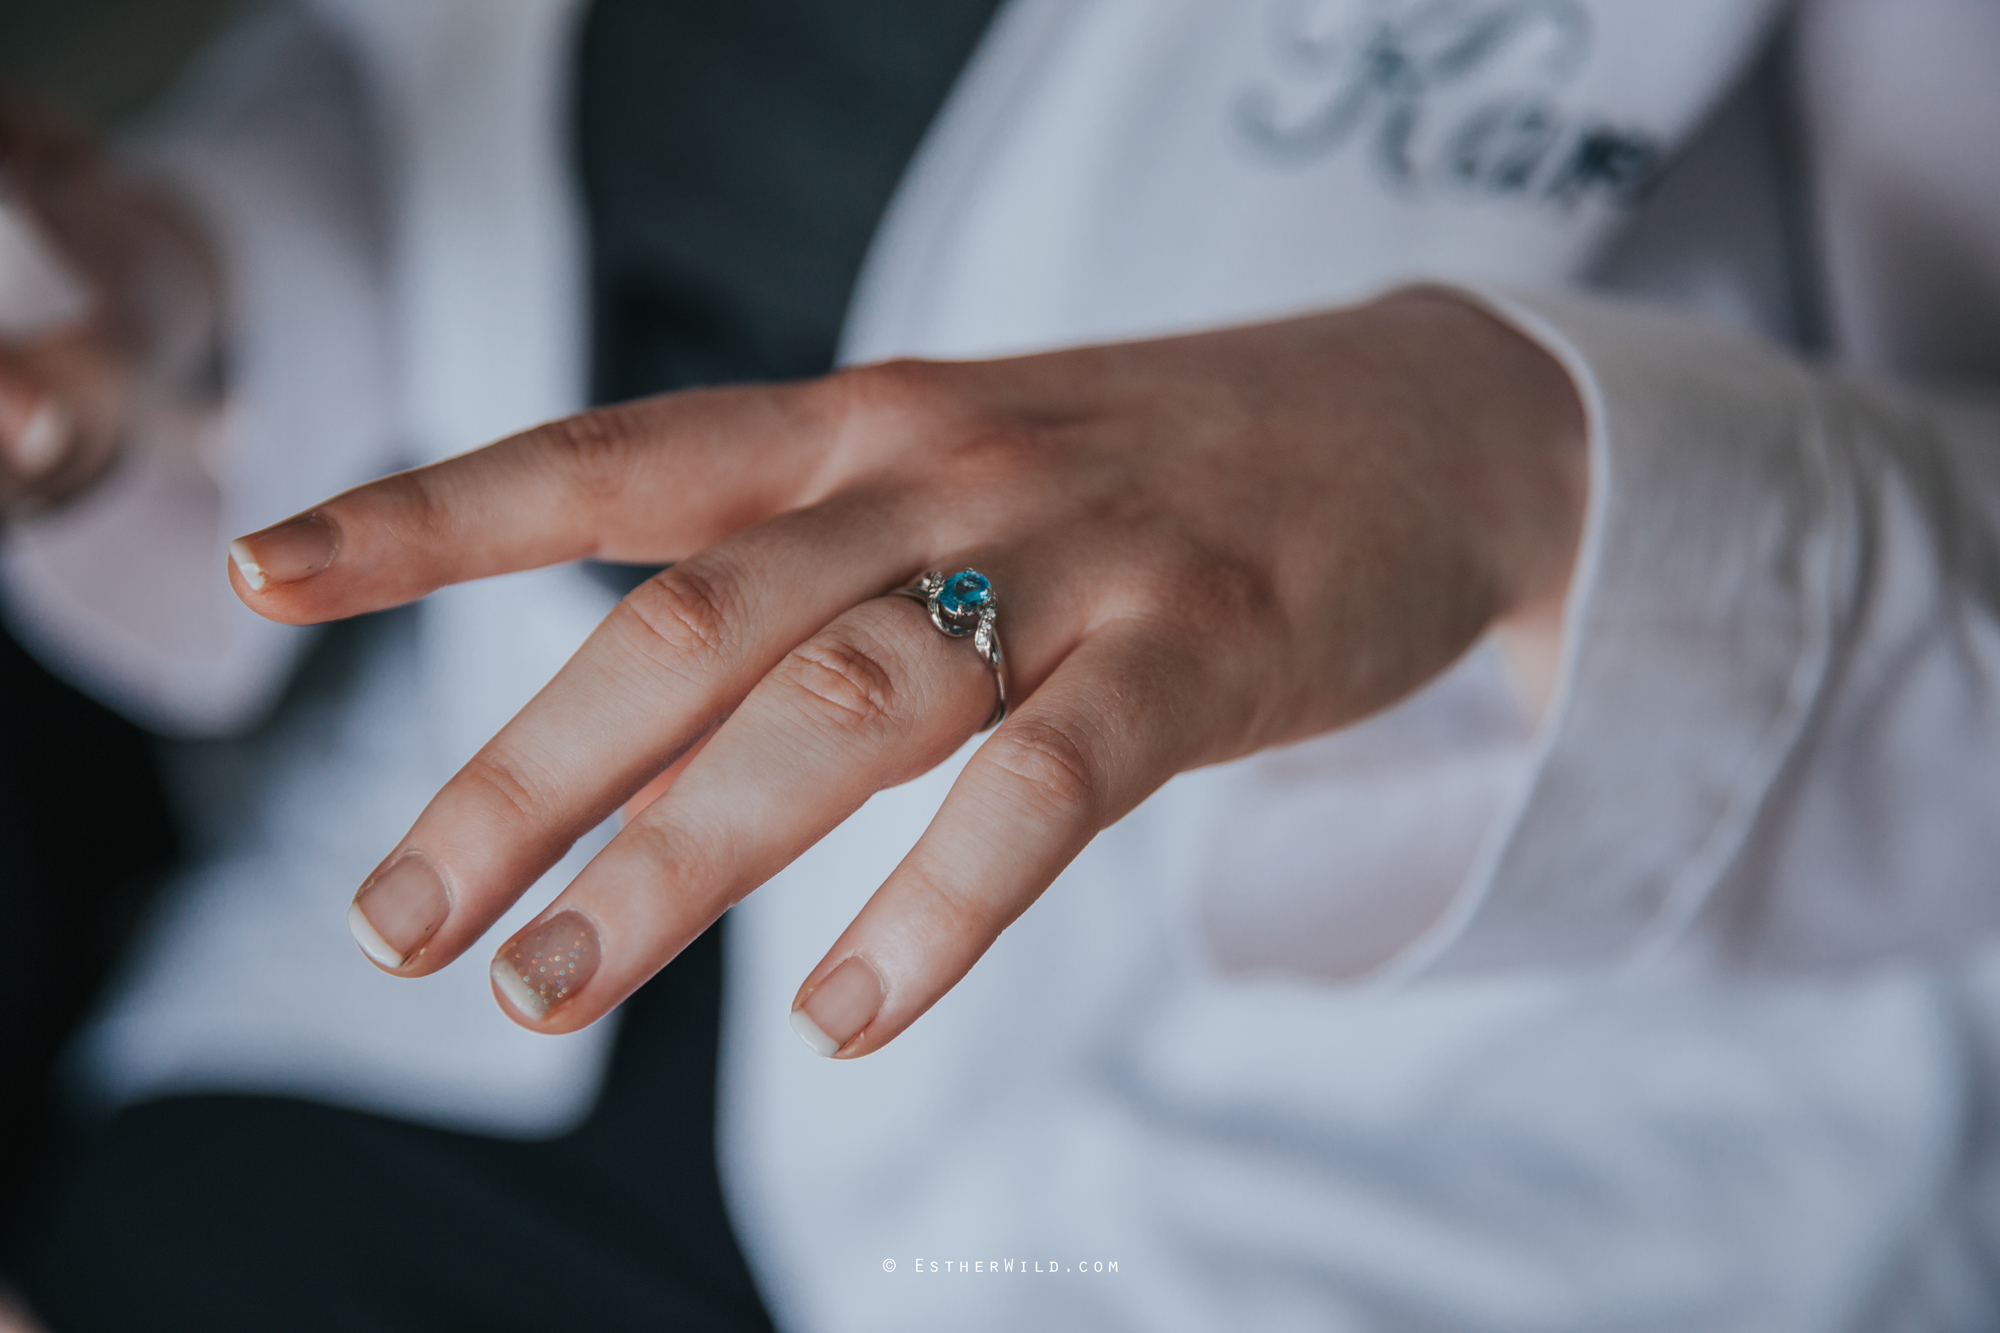 Old_Hall_Ely_Wedding_Esther_Wild_Photographer_IMG_0362.jpg